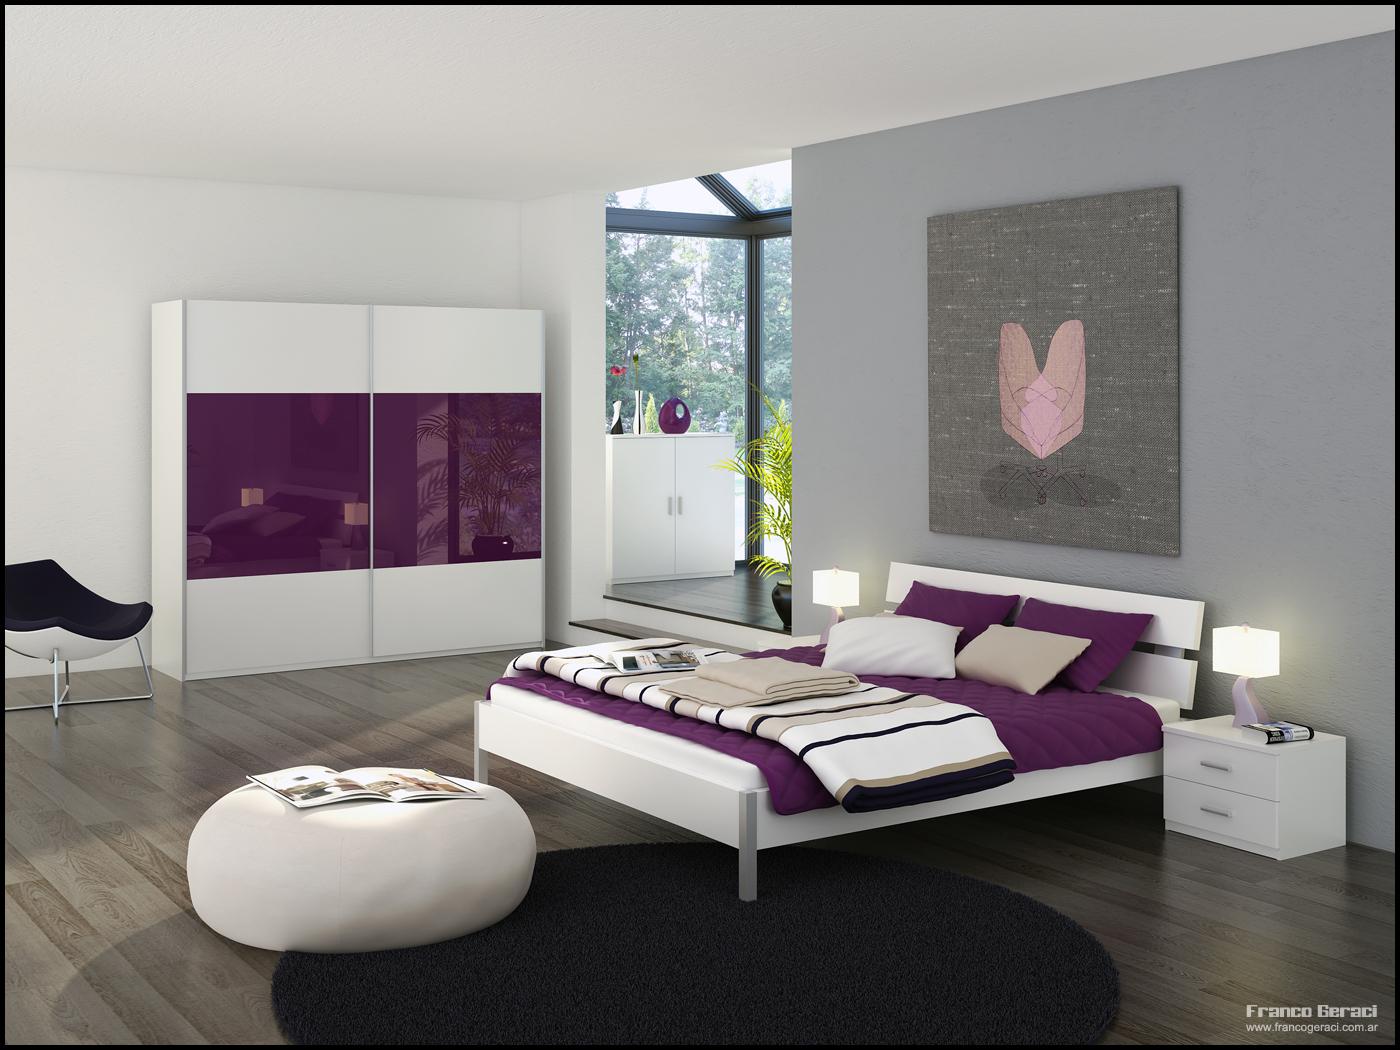 3D Bedroom 12 by FEG. 3D Bedroom by FEG on DeviantArt